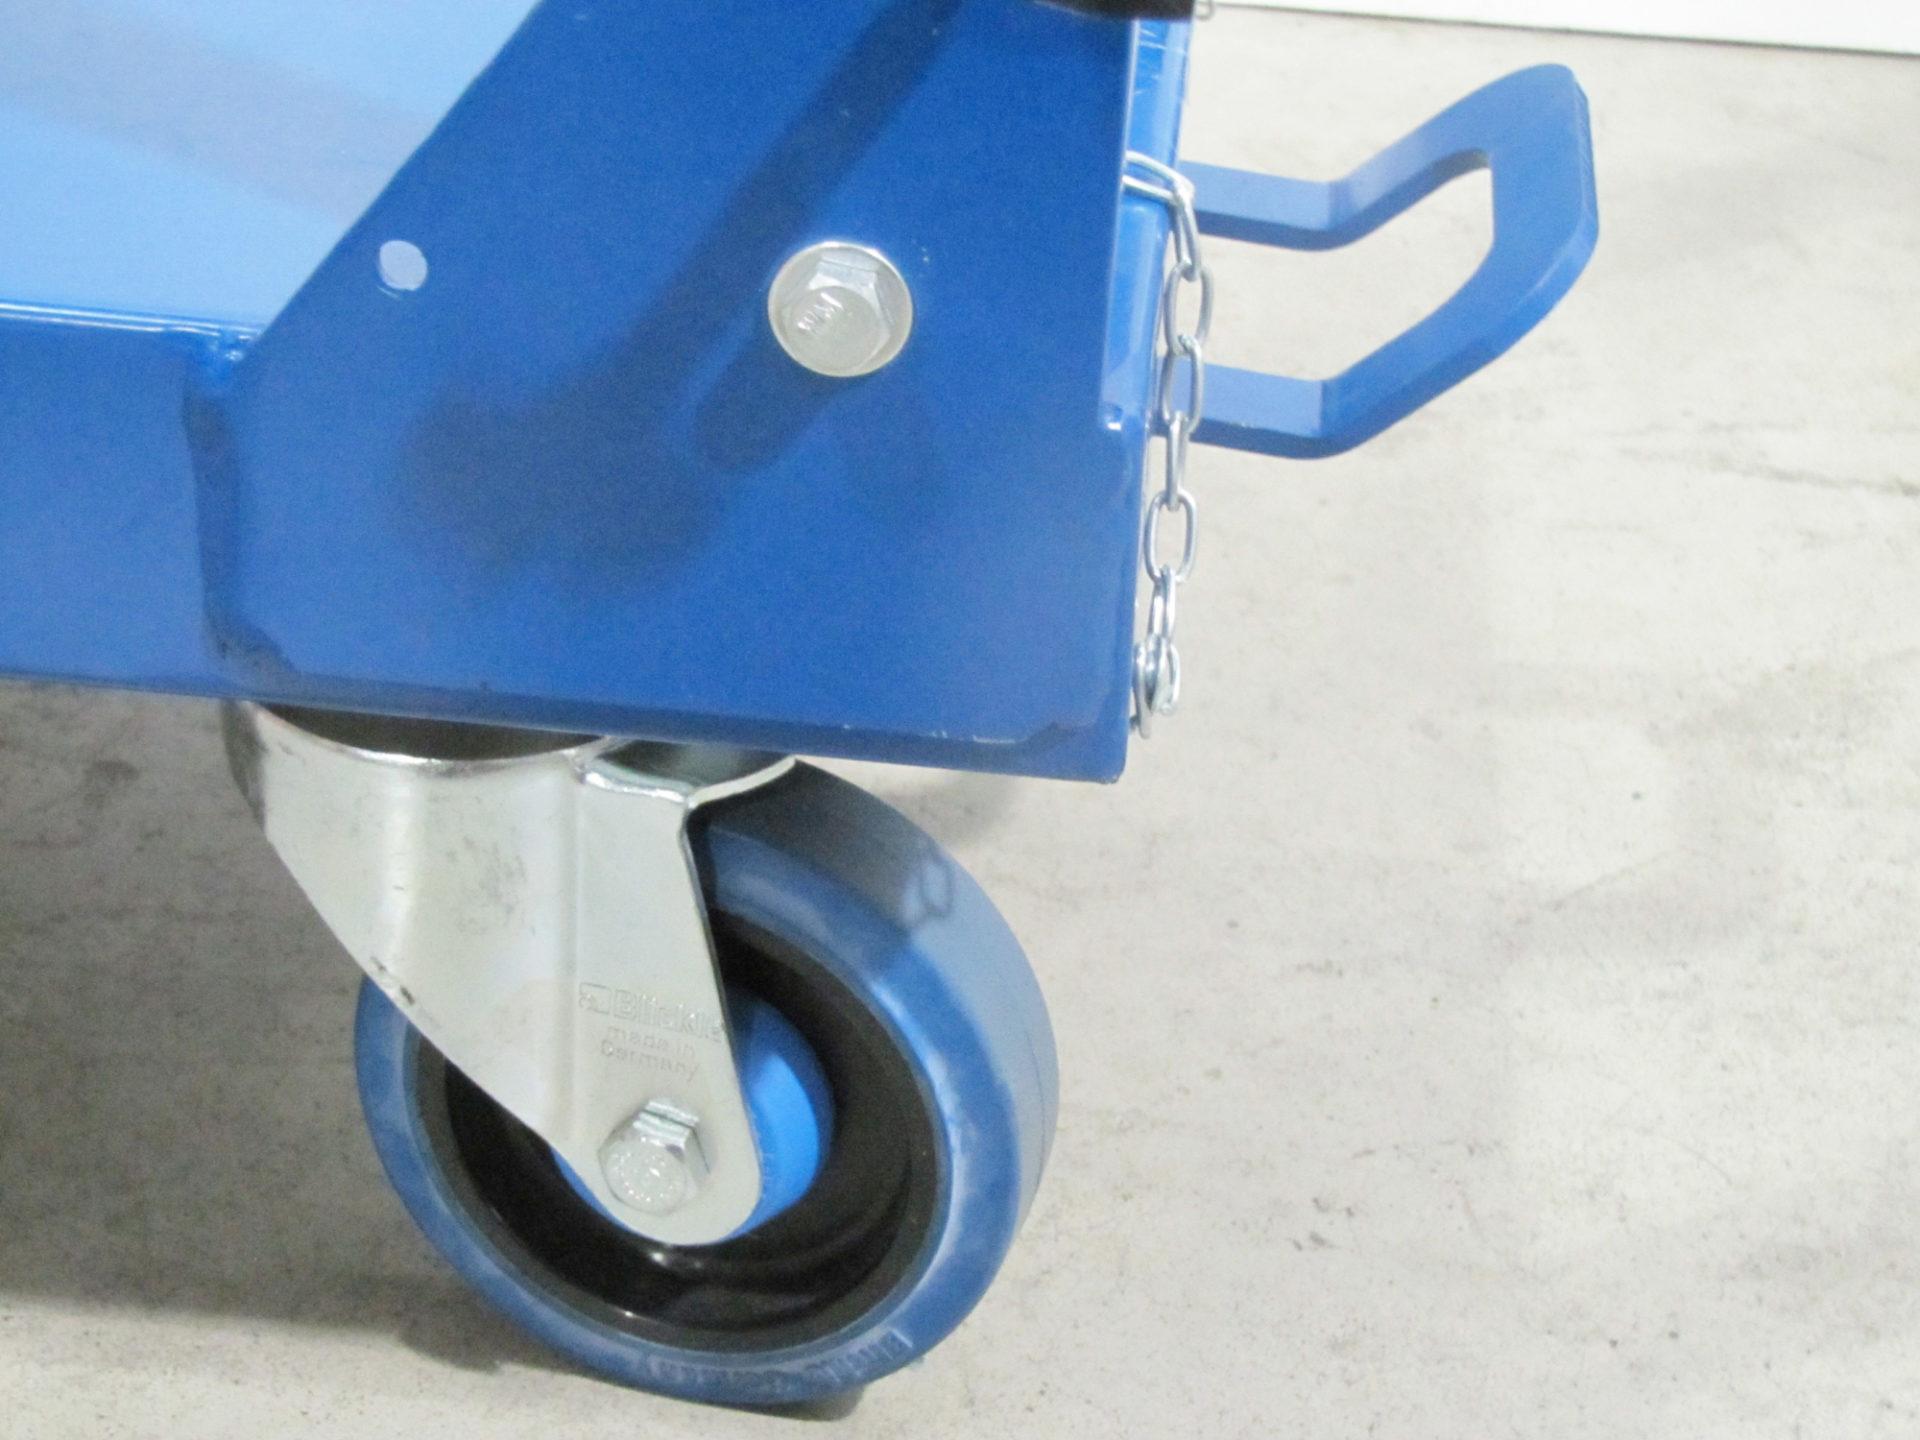 Order your central-locking brake system